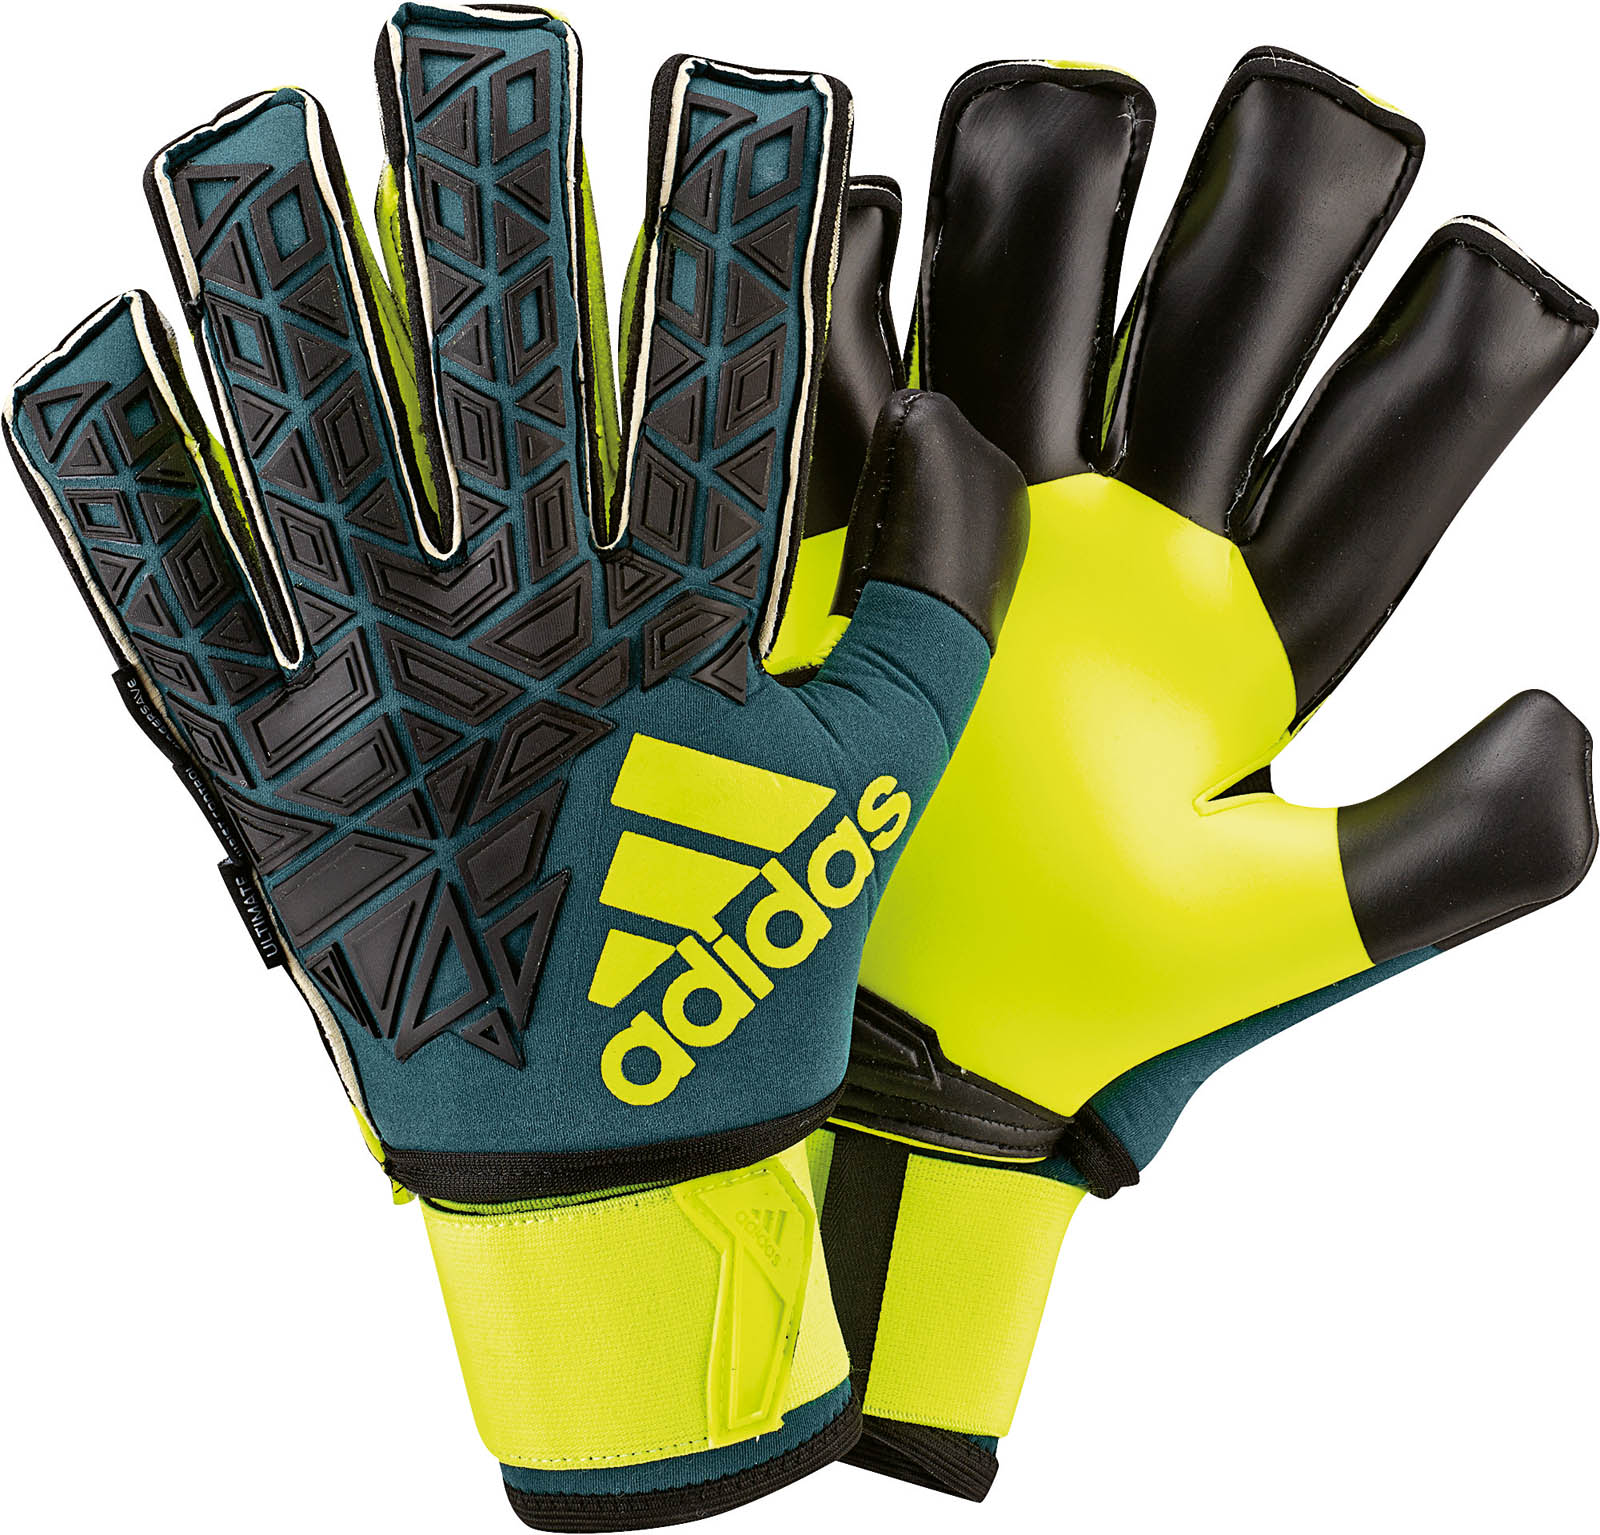 Adidas Predator Pro Classic Soccer Goalkeeper Gloves ... |Goalkeeper Gloves Adidas 2015